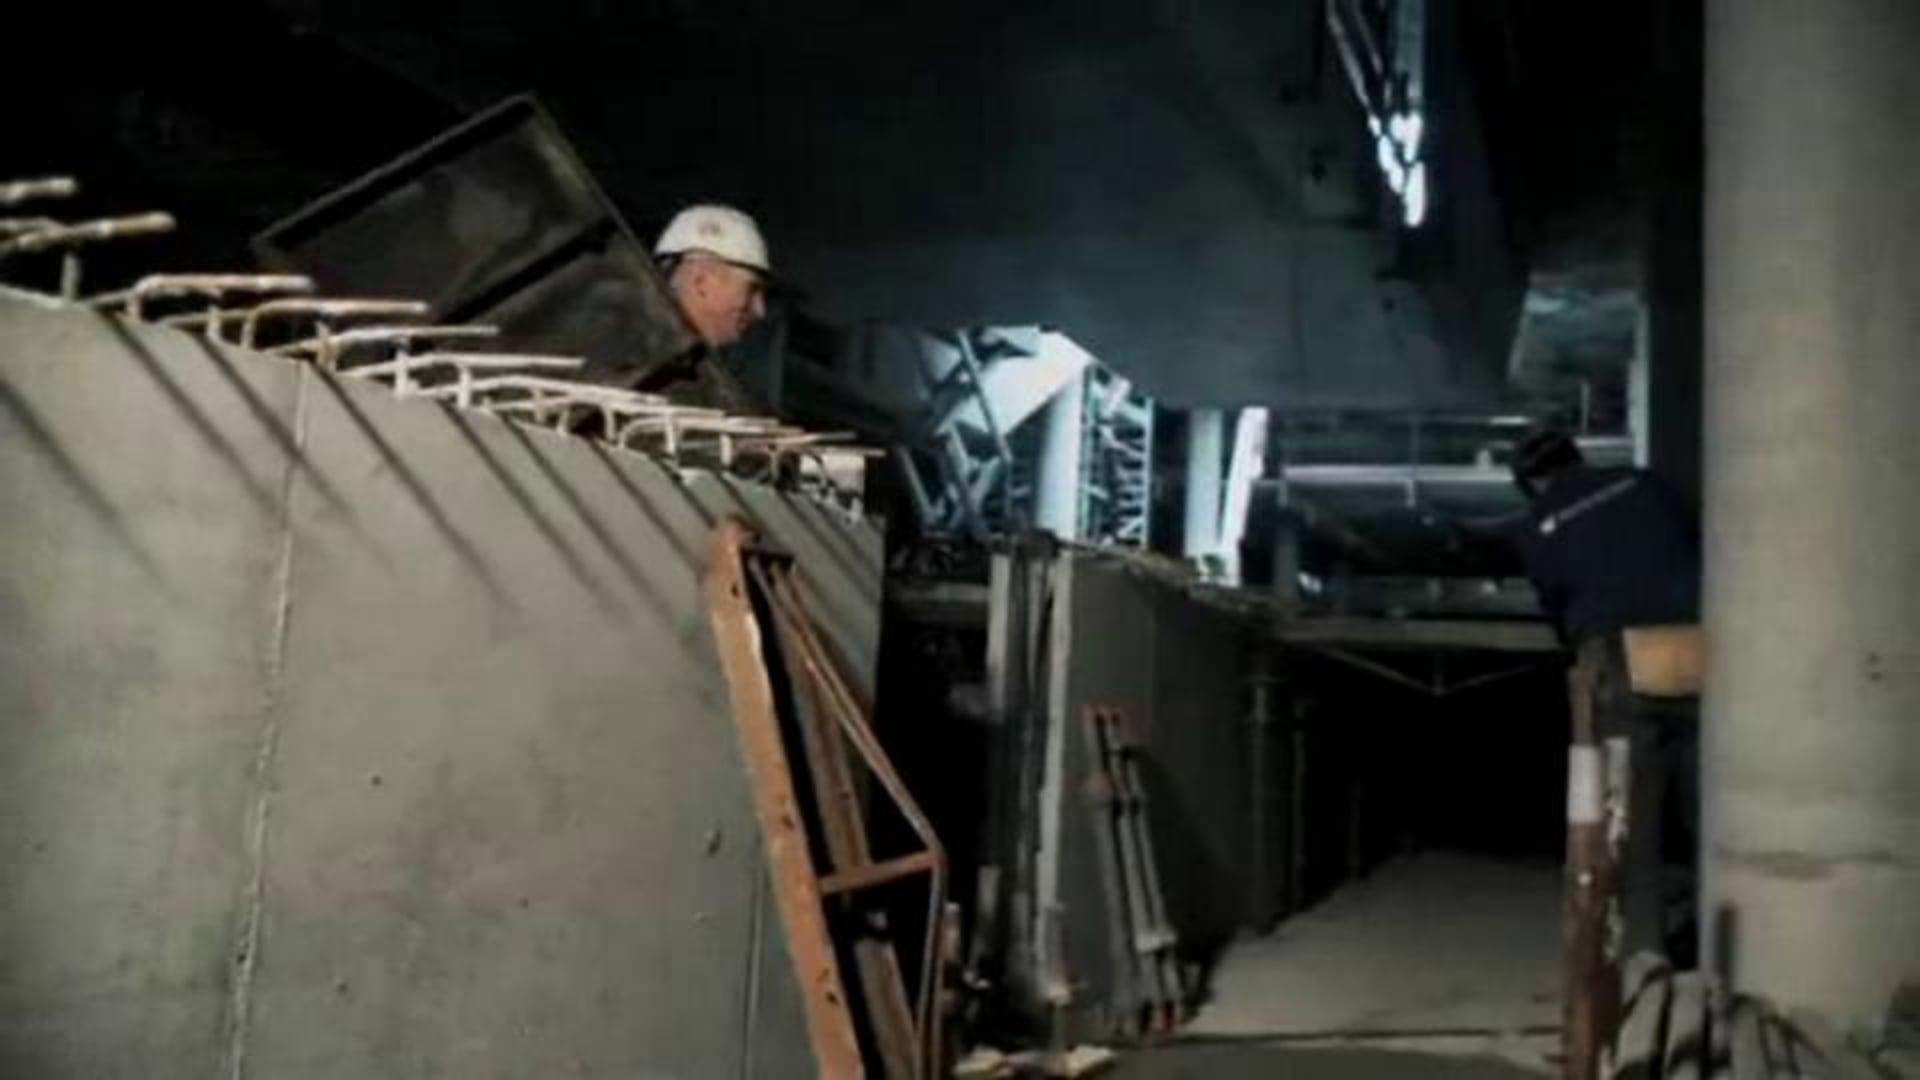 GEMEENTEWERKEN ROTTERDAM  - corporate film